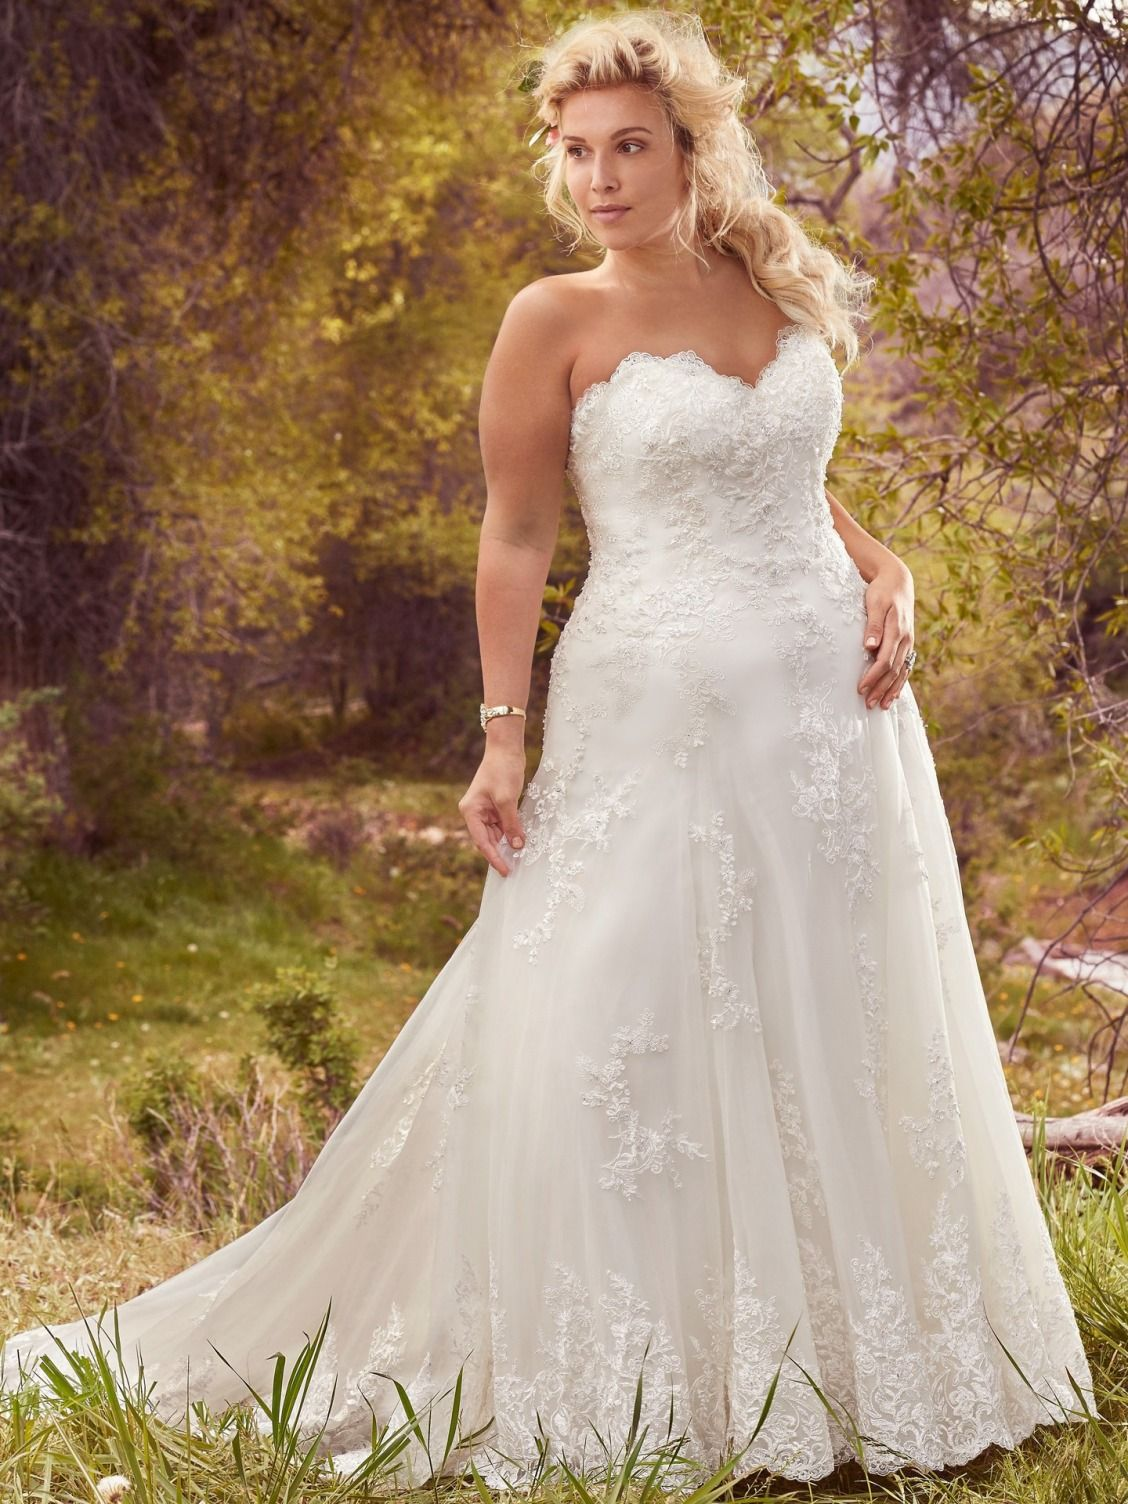 Wedding Dresses Bridal Gowns Wedding Dresses Trendy Wedding Dresses Sweetheart Wedding Dress [ 1504 x 1128 Pixel ]